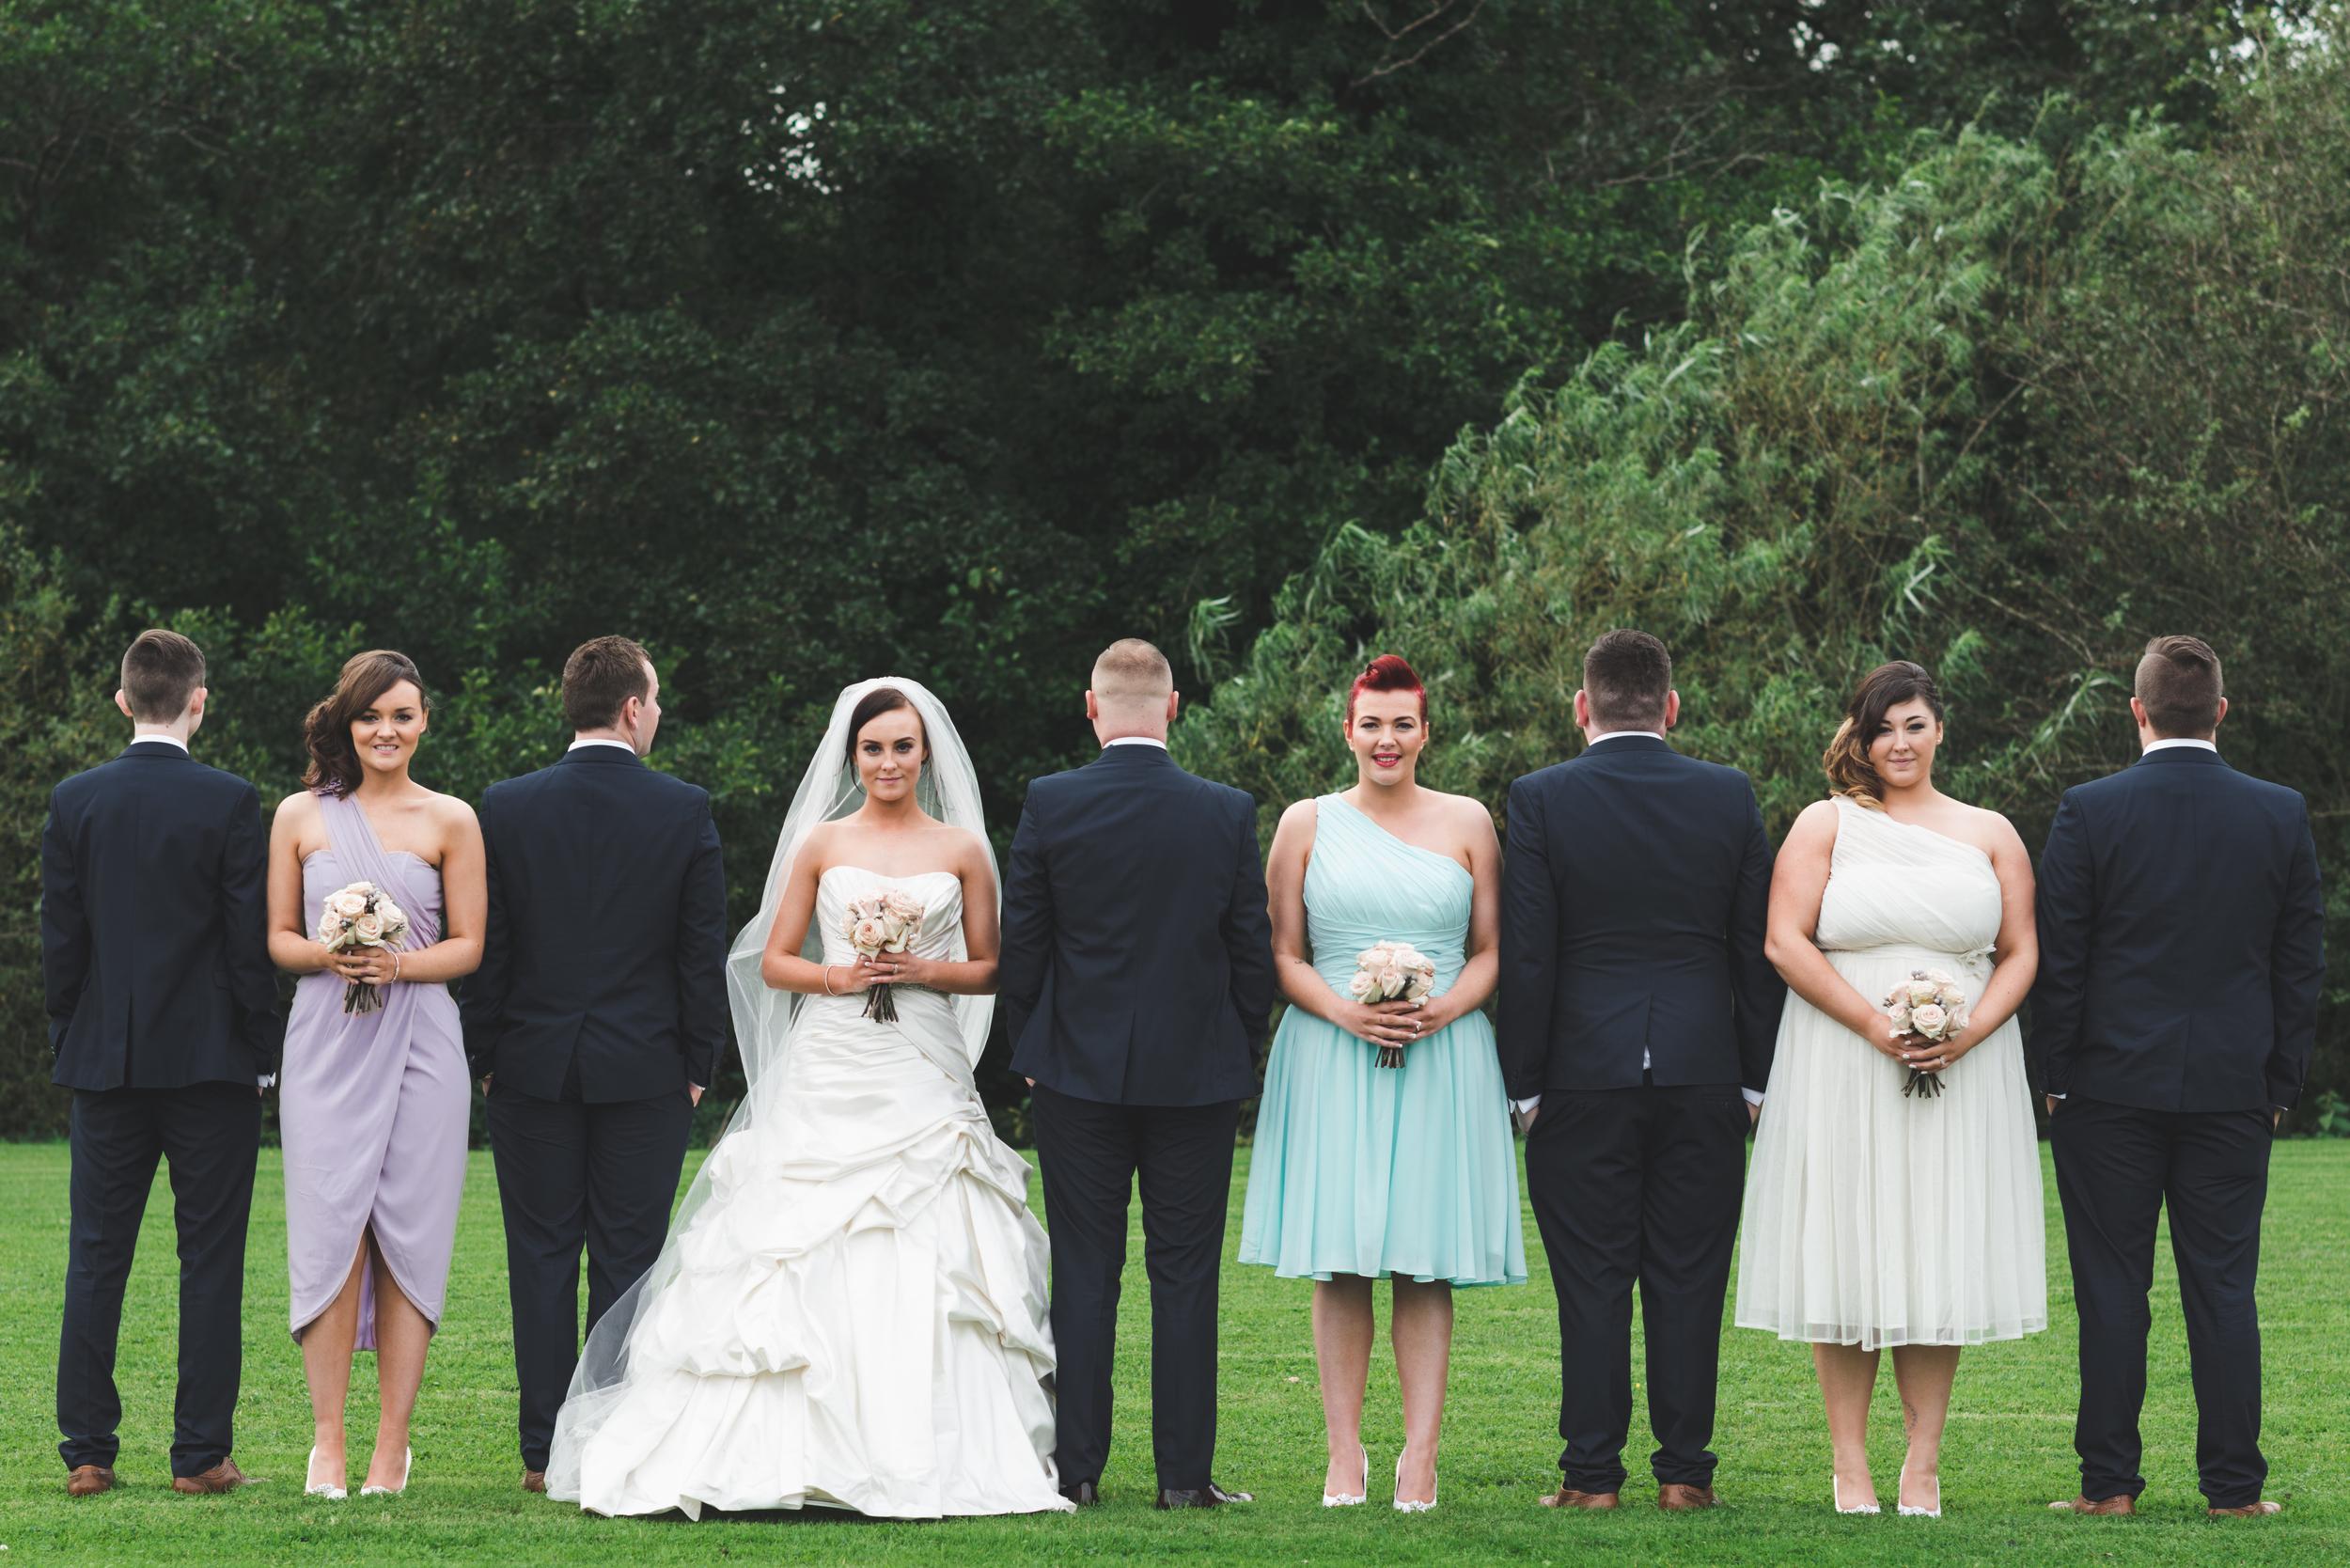 Northern_Ireland_Wedding_Photographer_Purephotoni_Dunsilly_Hotel_Wedding_Makeup_Bridealparty